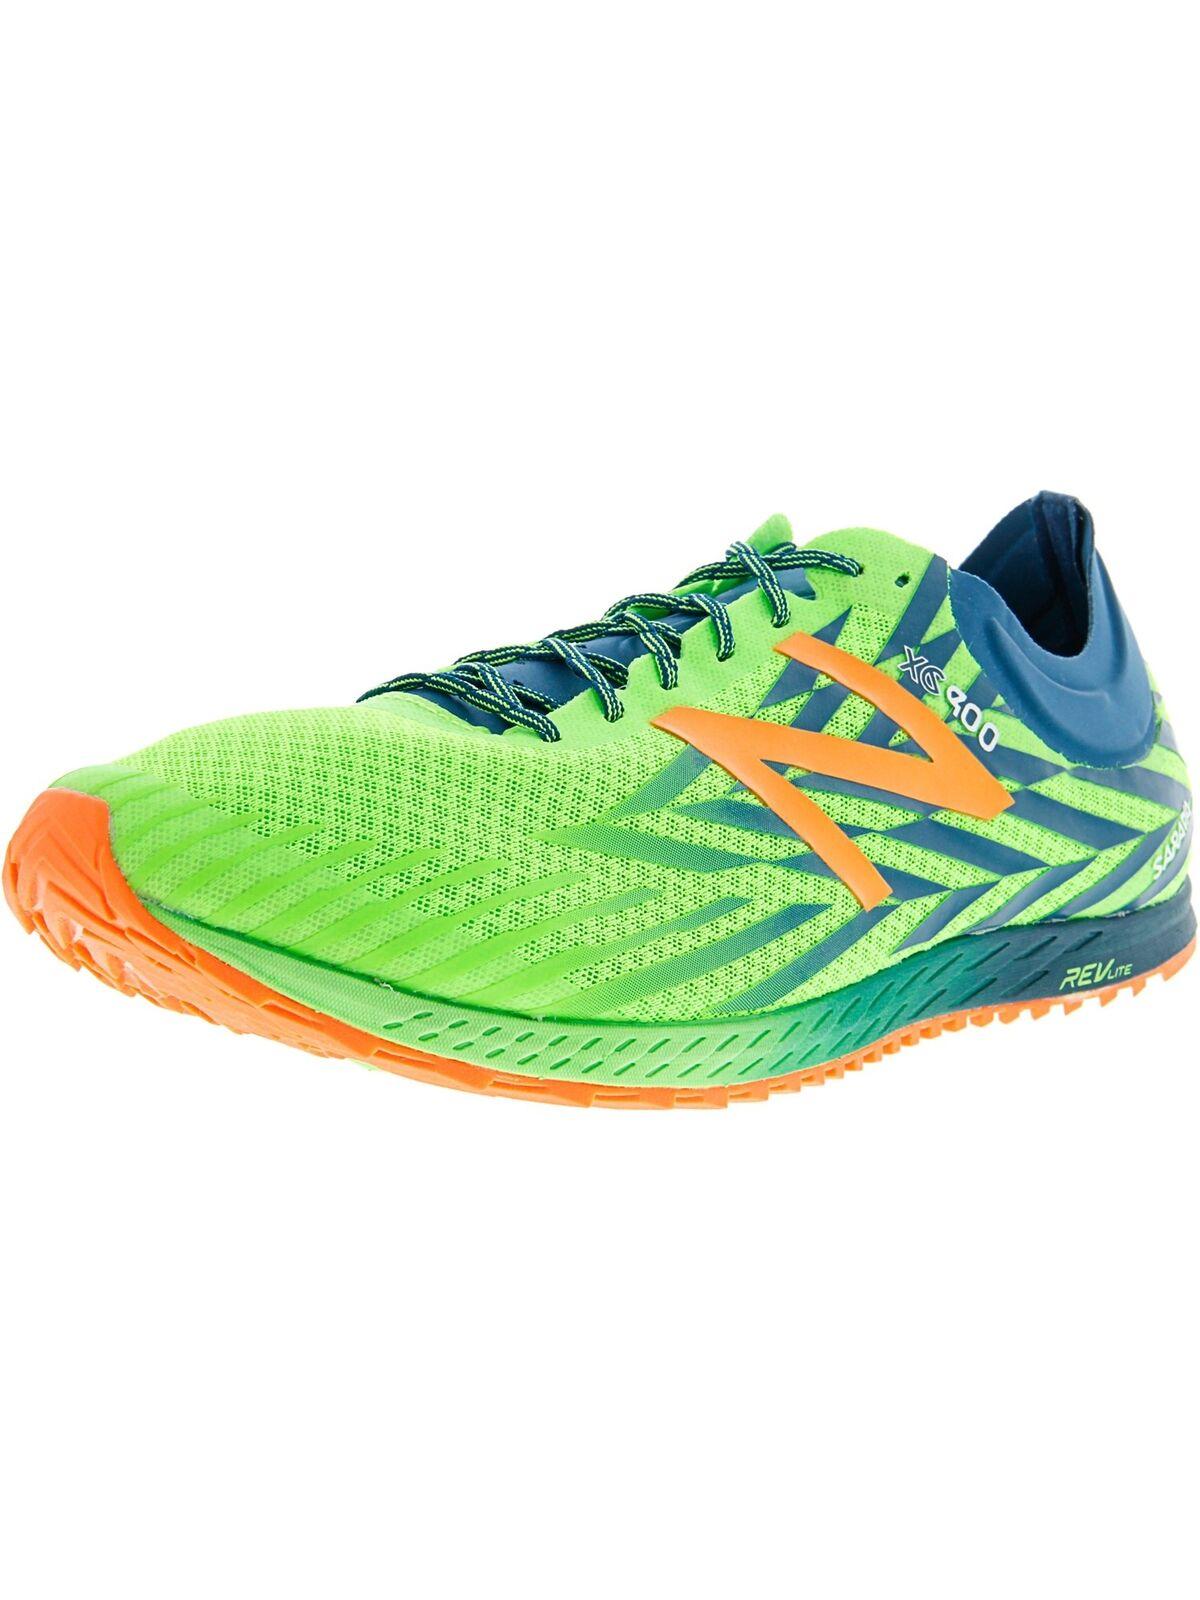 a9f6113472e1 New Balance Men s Running shoes Mxcr900 Ankle-High nabjju6271 ...